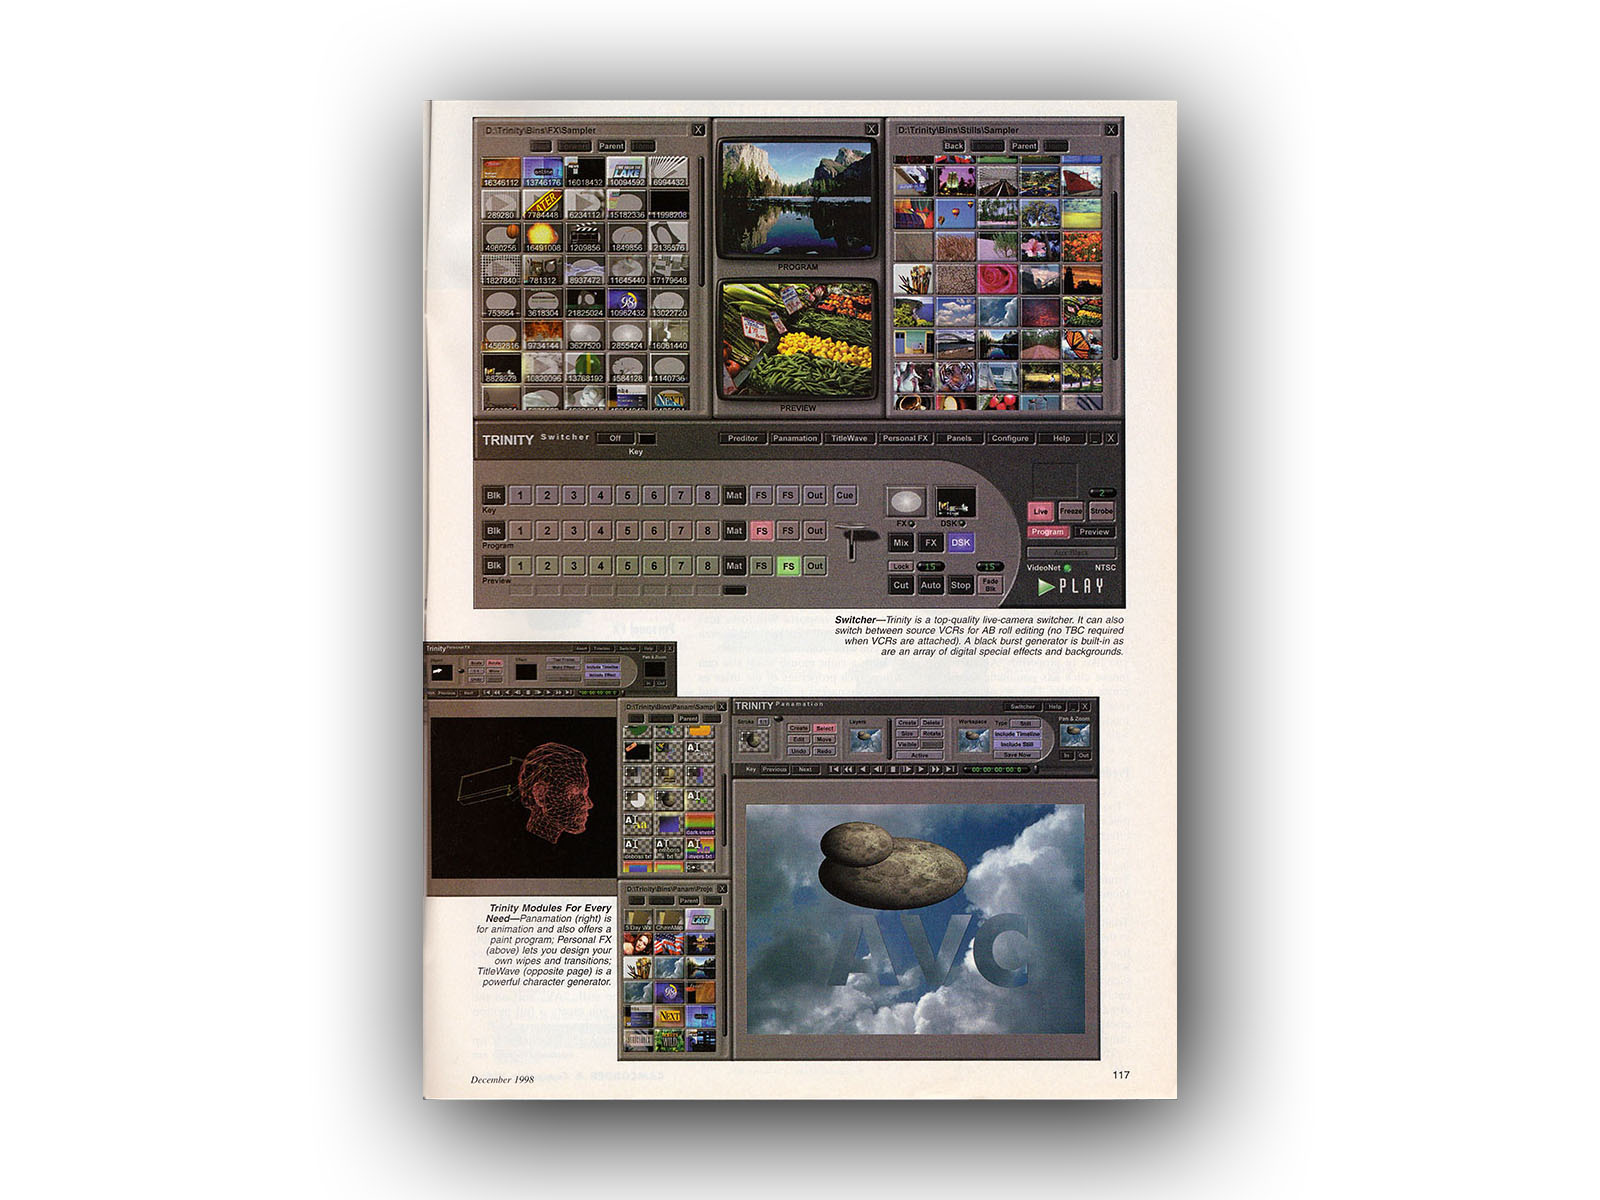 _0016_MagazineCamcorderCompuerVideo-Dec98-P117_web.jpg